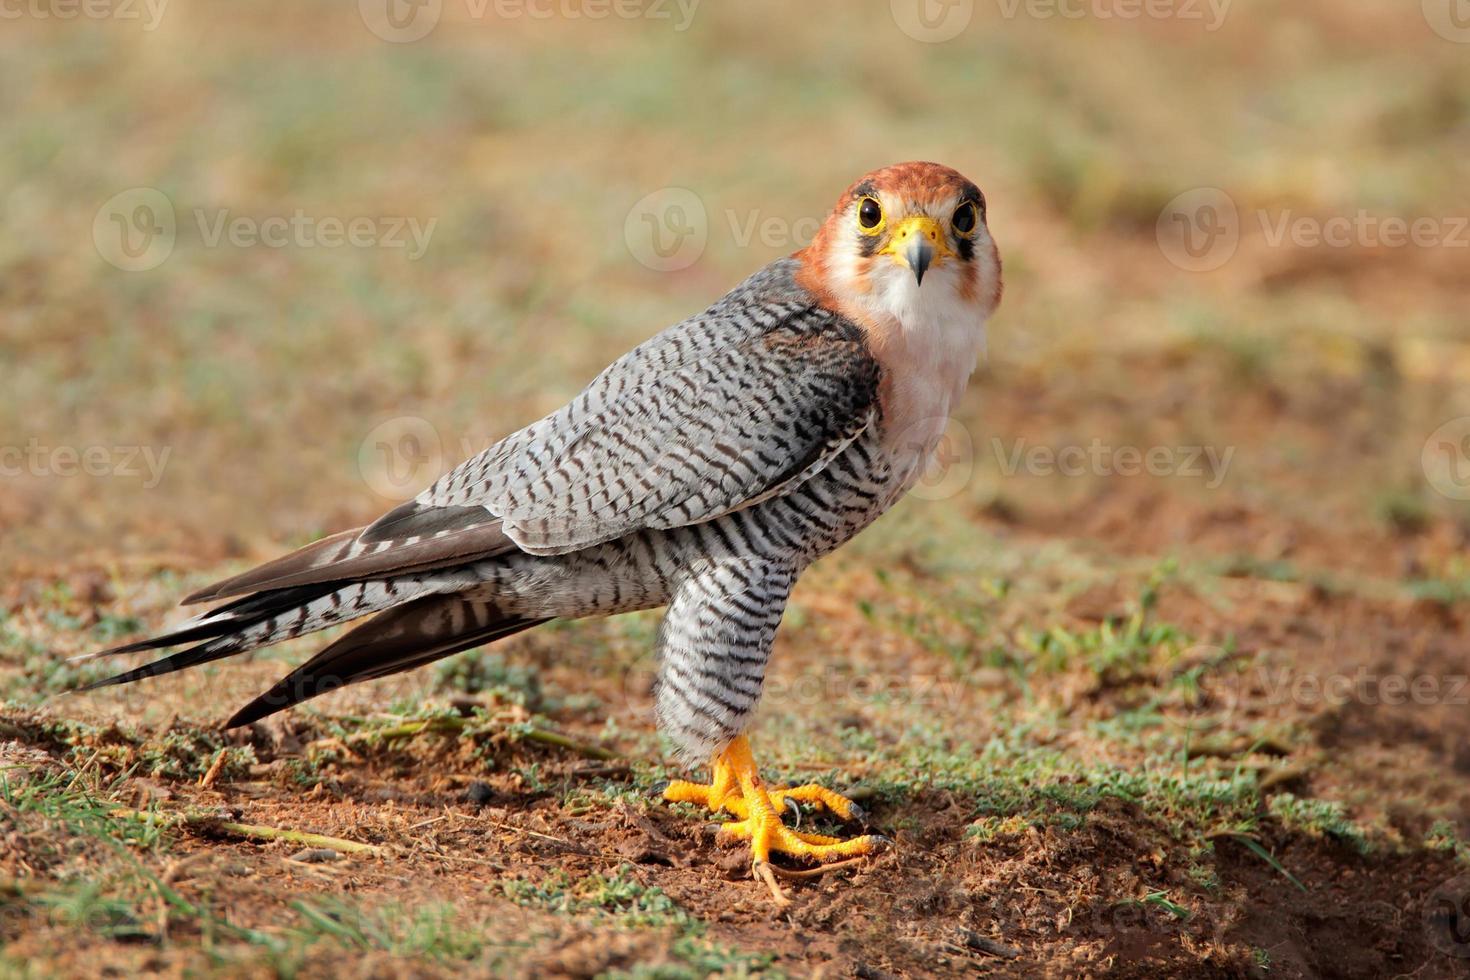 Red-necked falcon photo